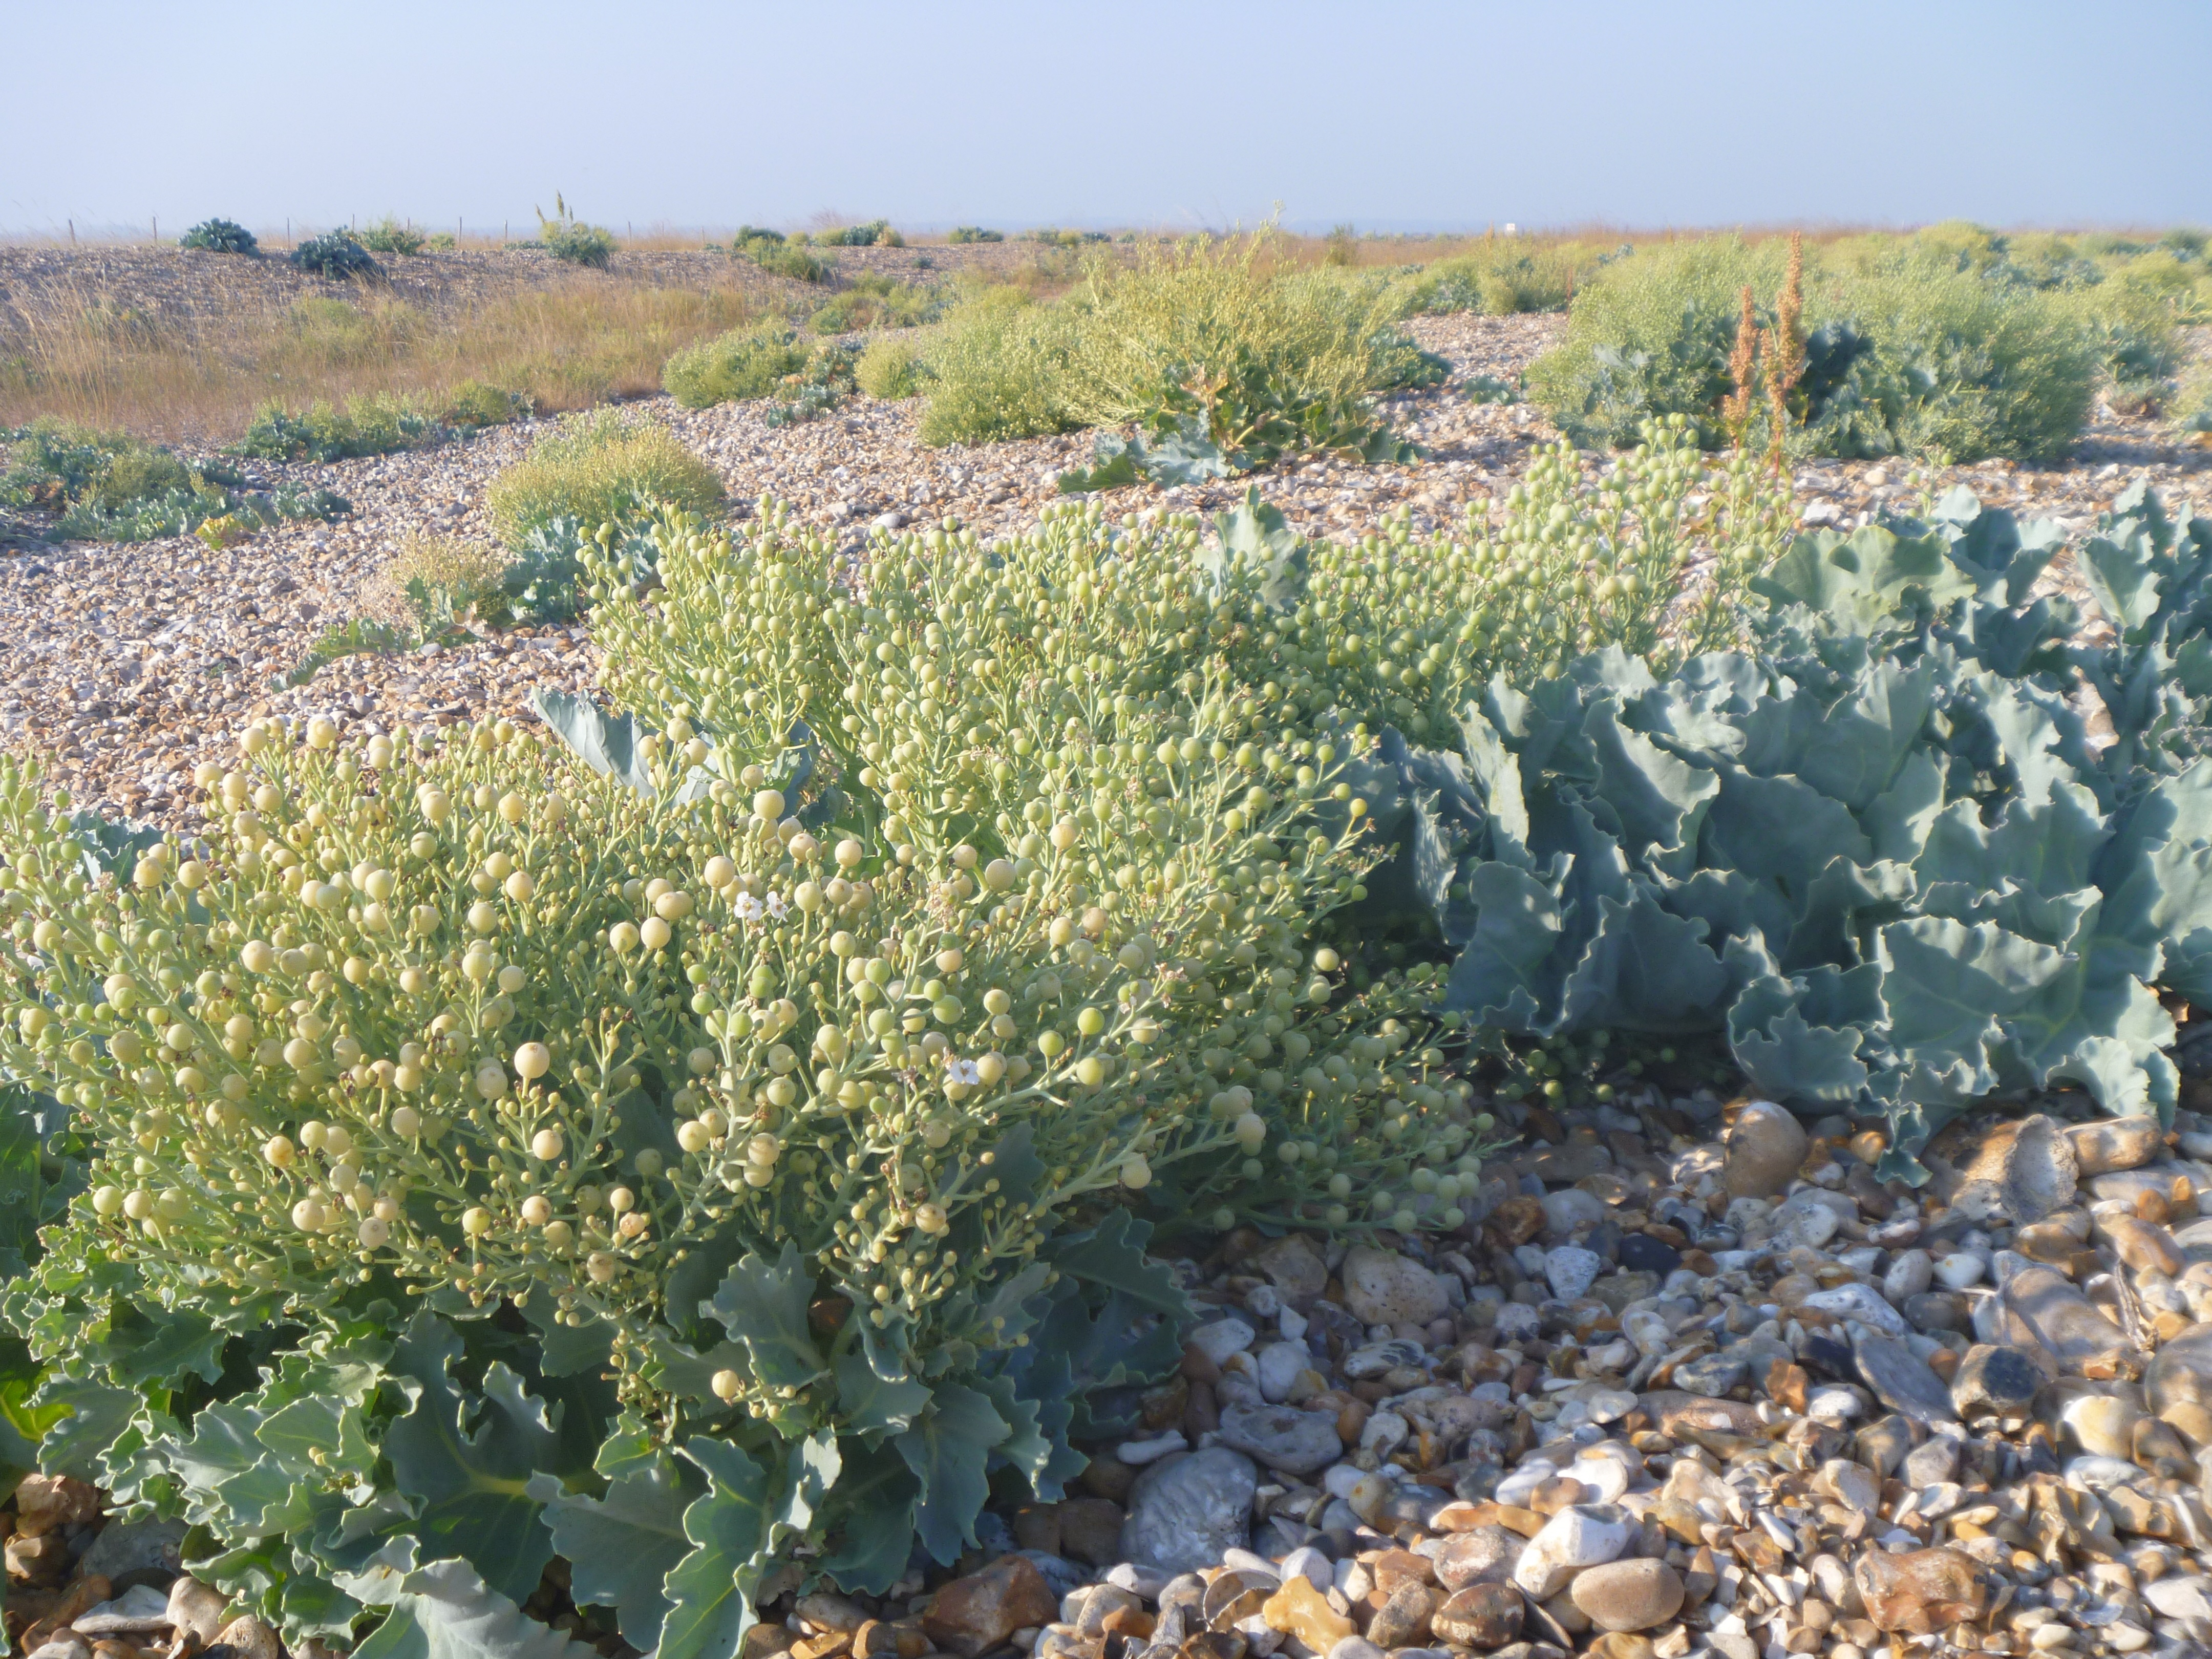 close up of sea kale berries